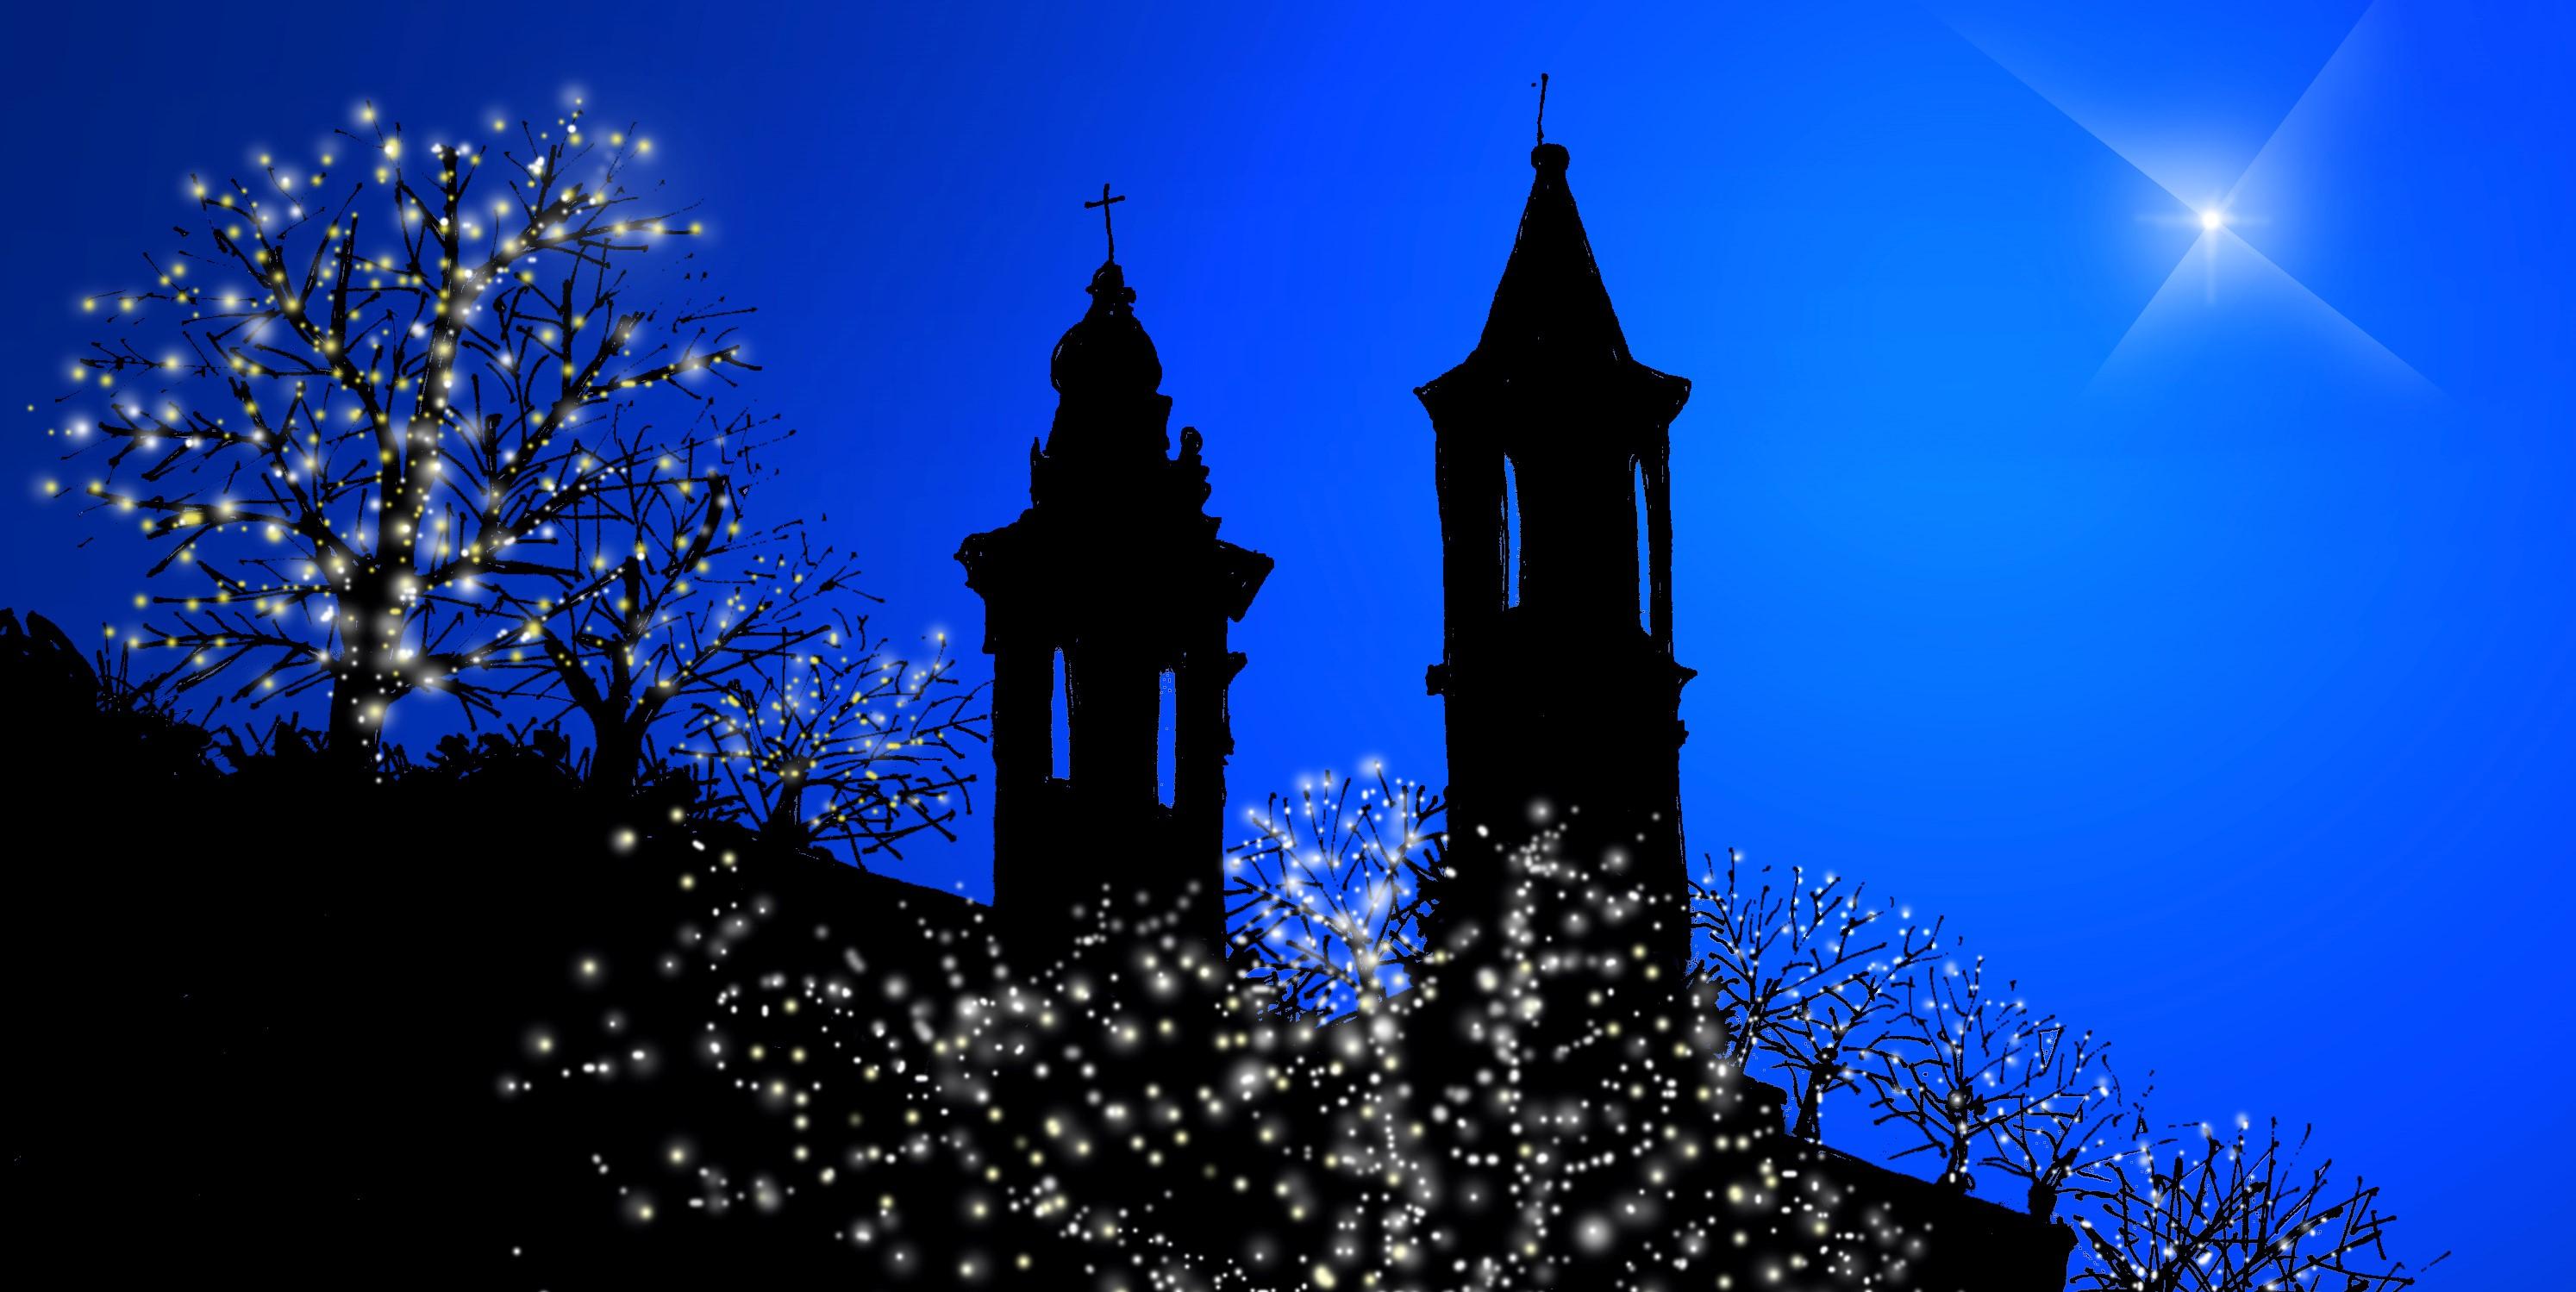 Auguri Di Natale Bellissimi.Auguri Di Buone Feste Amici Di Bellissimi